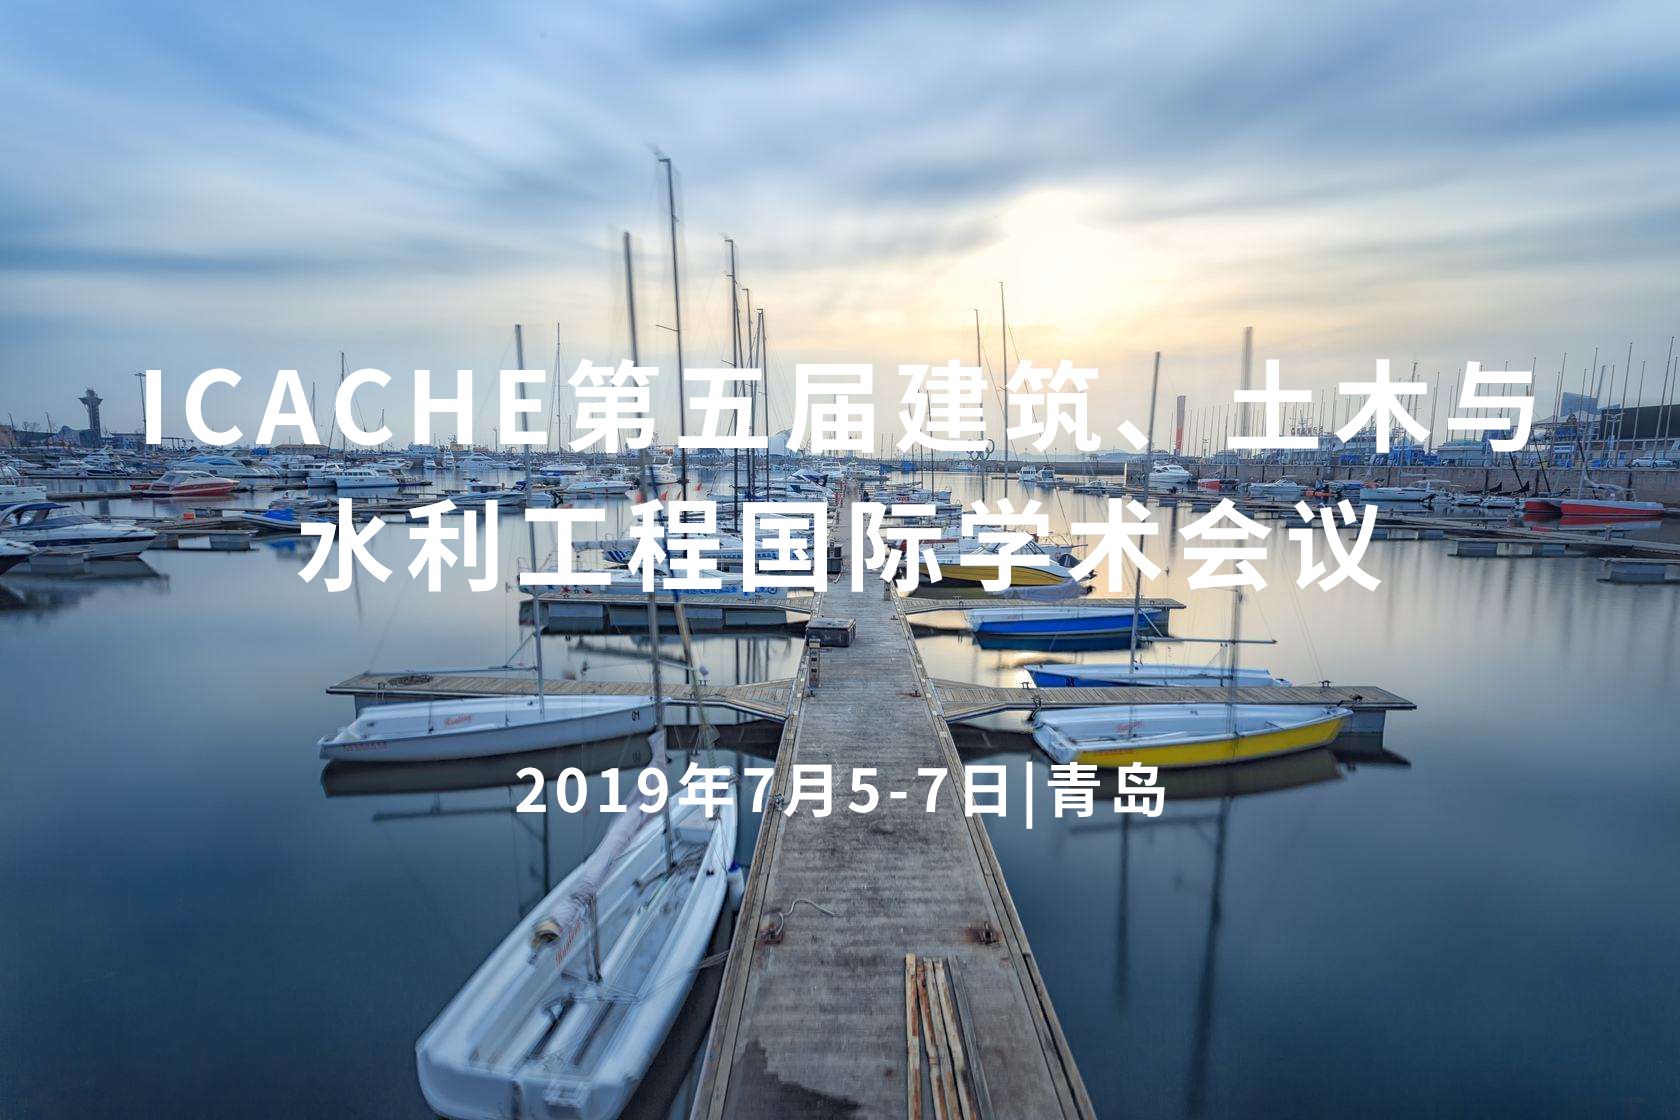 ICACHE 2019第五届建筑、土木与水利工程国际学术会议(青岛)